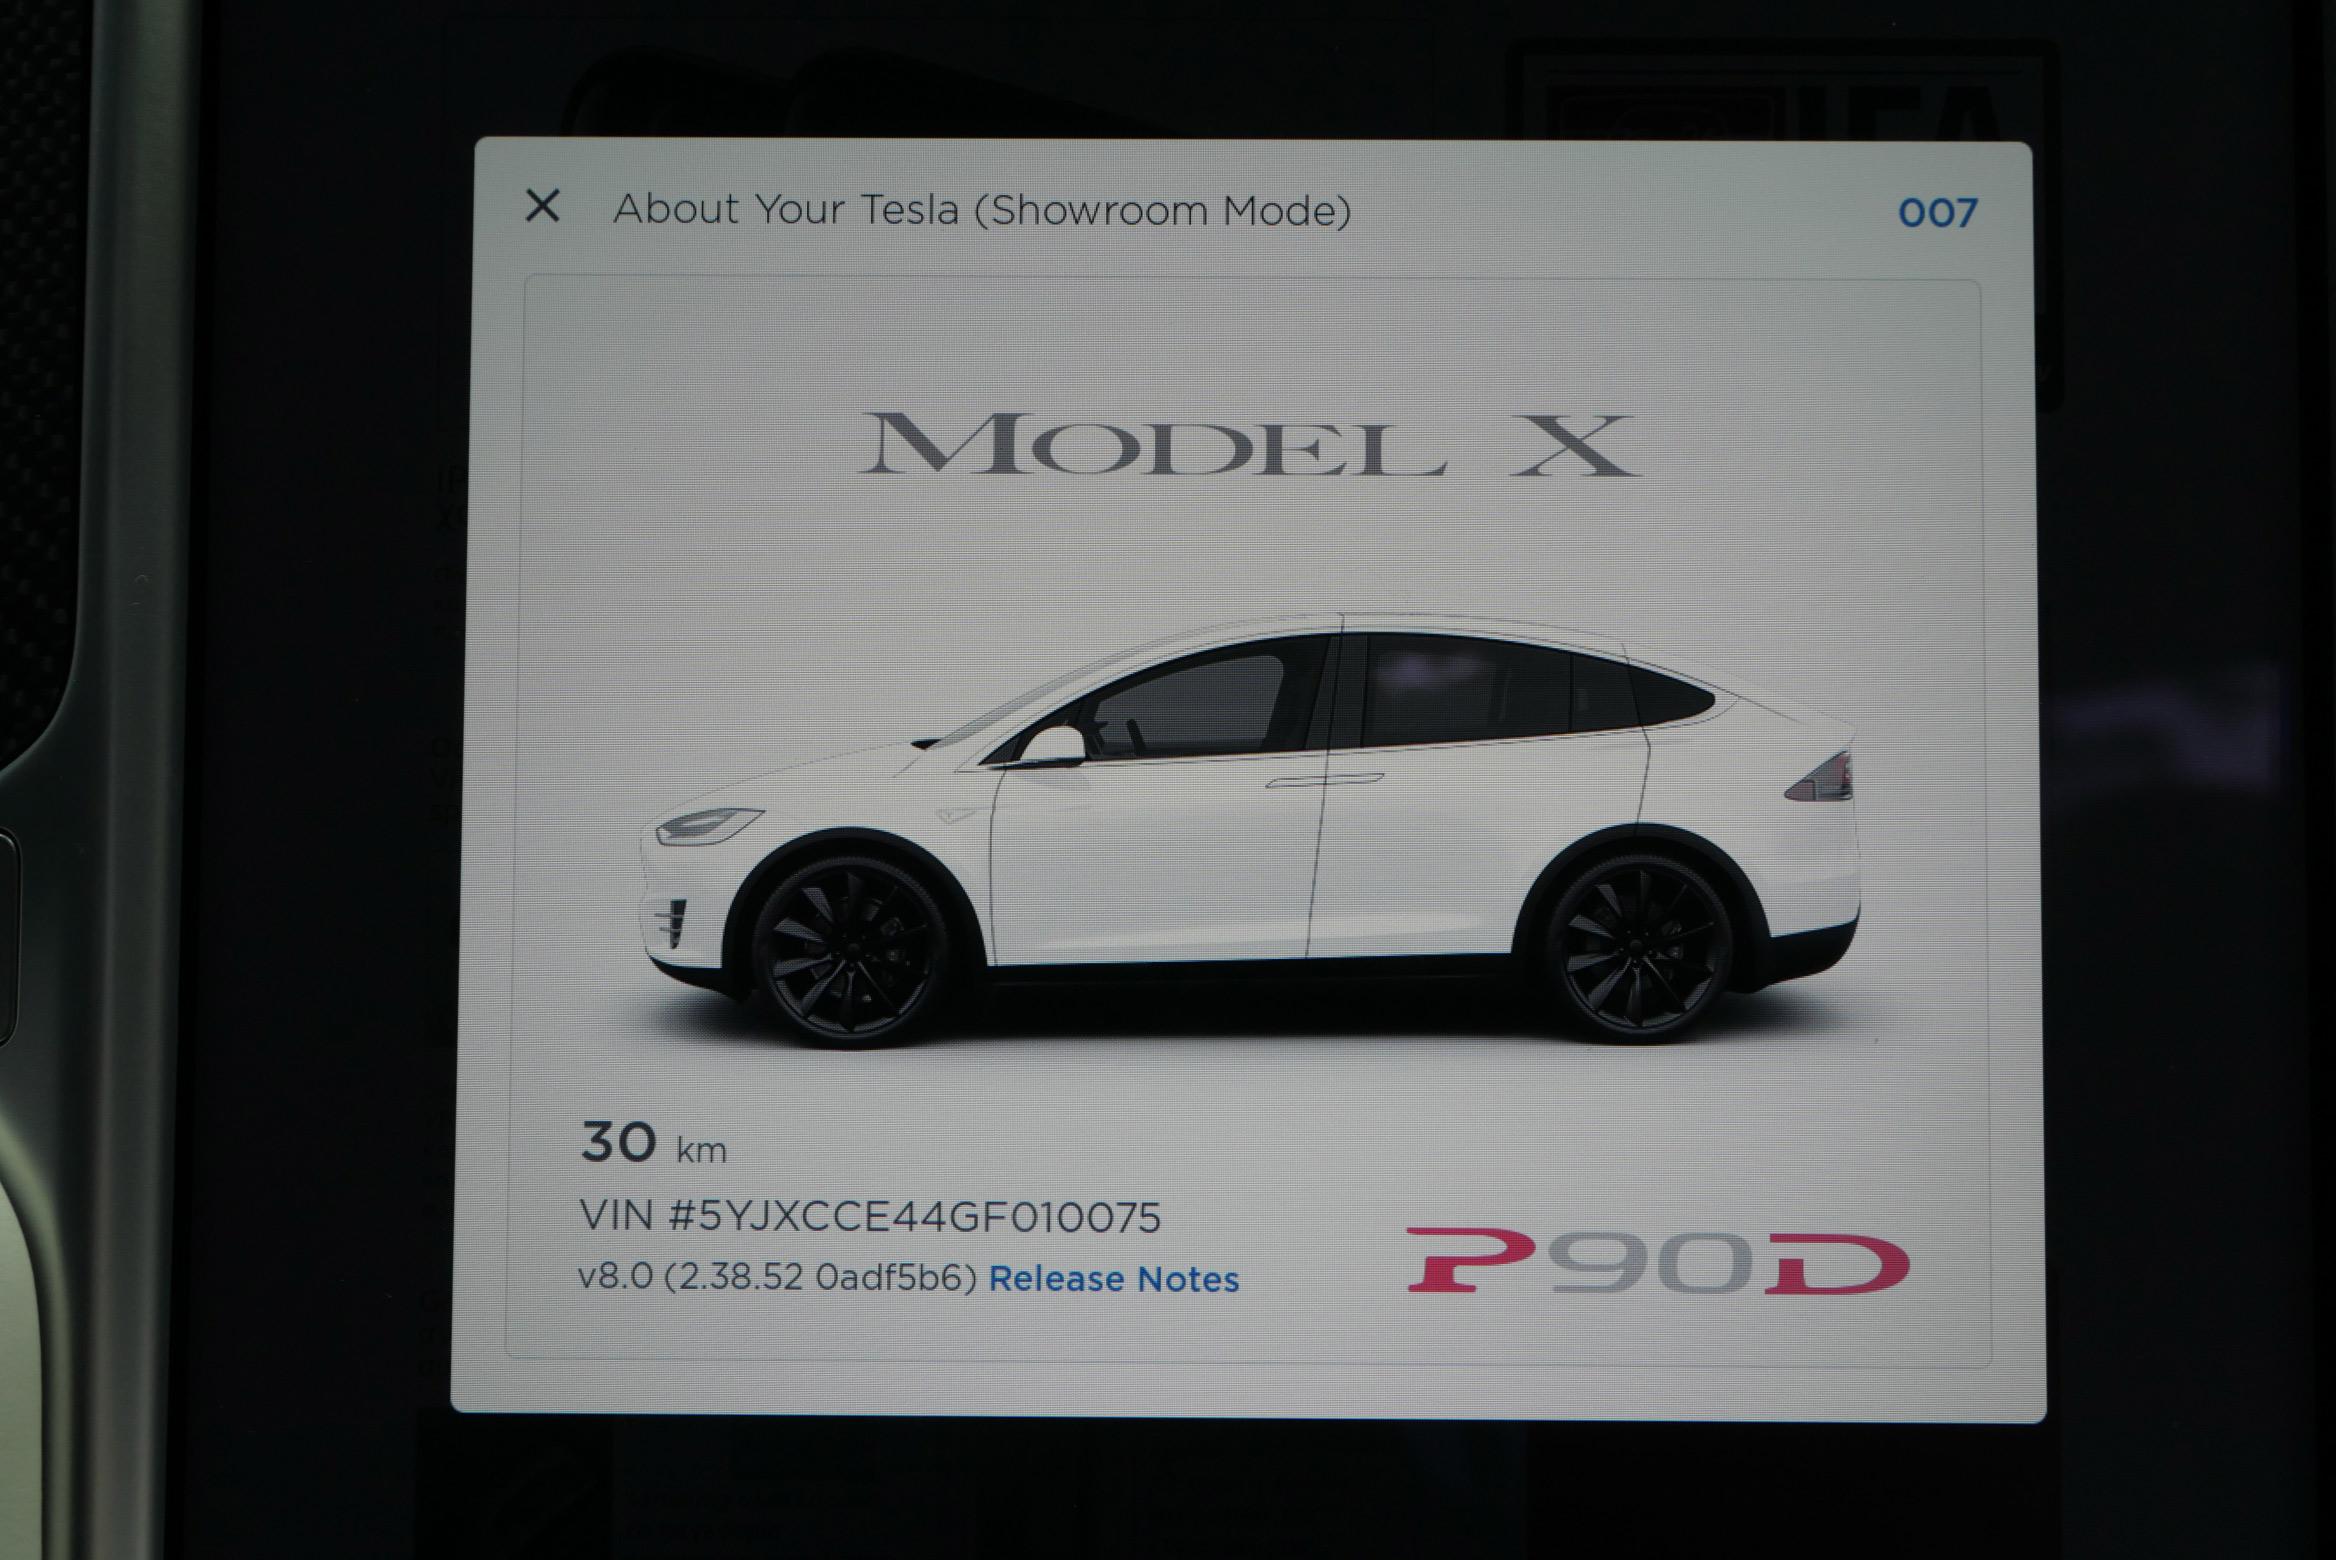 Tesla Model X Autopilot version 8.0